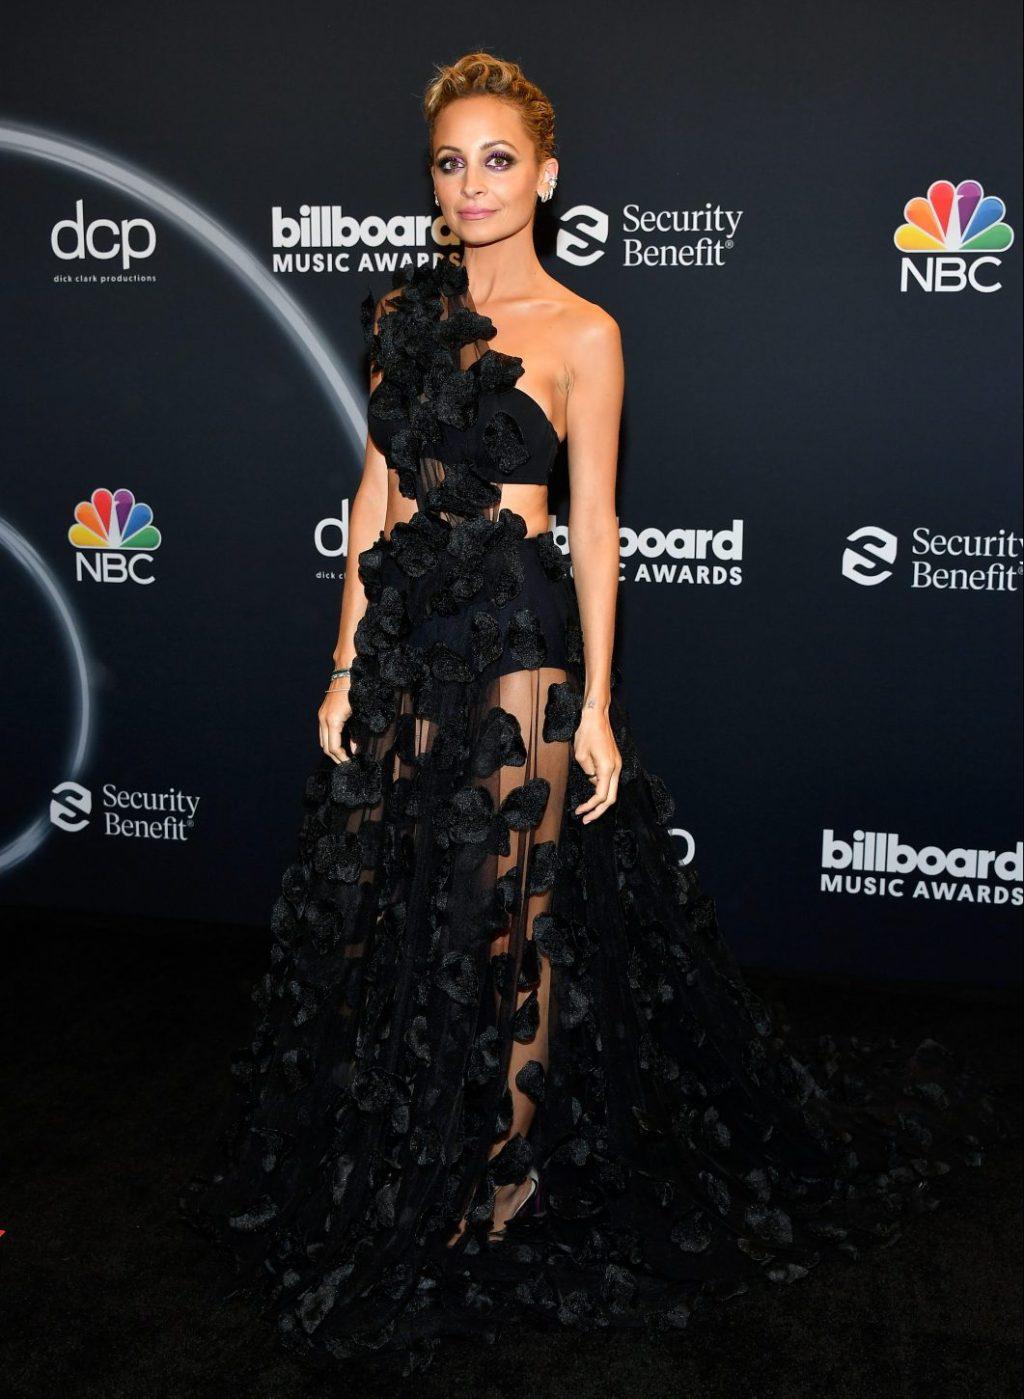 Nicole Richie at the 2020 Billboard Music Awards